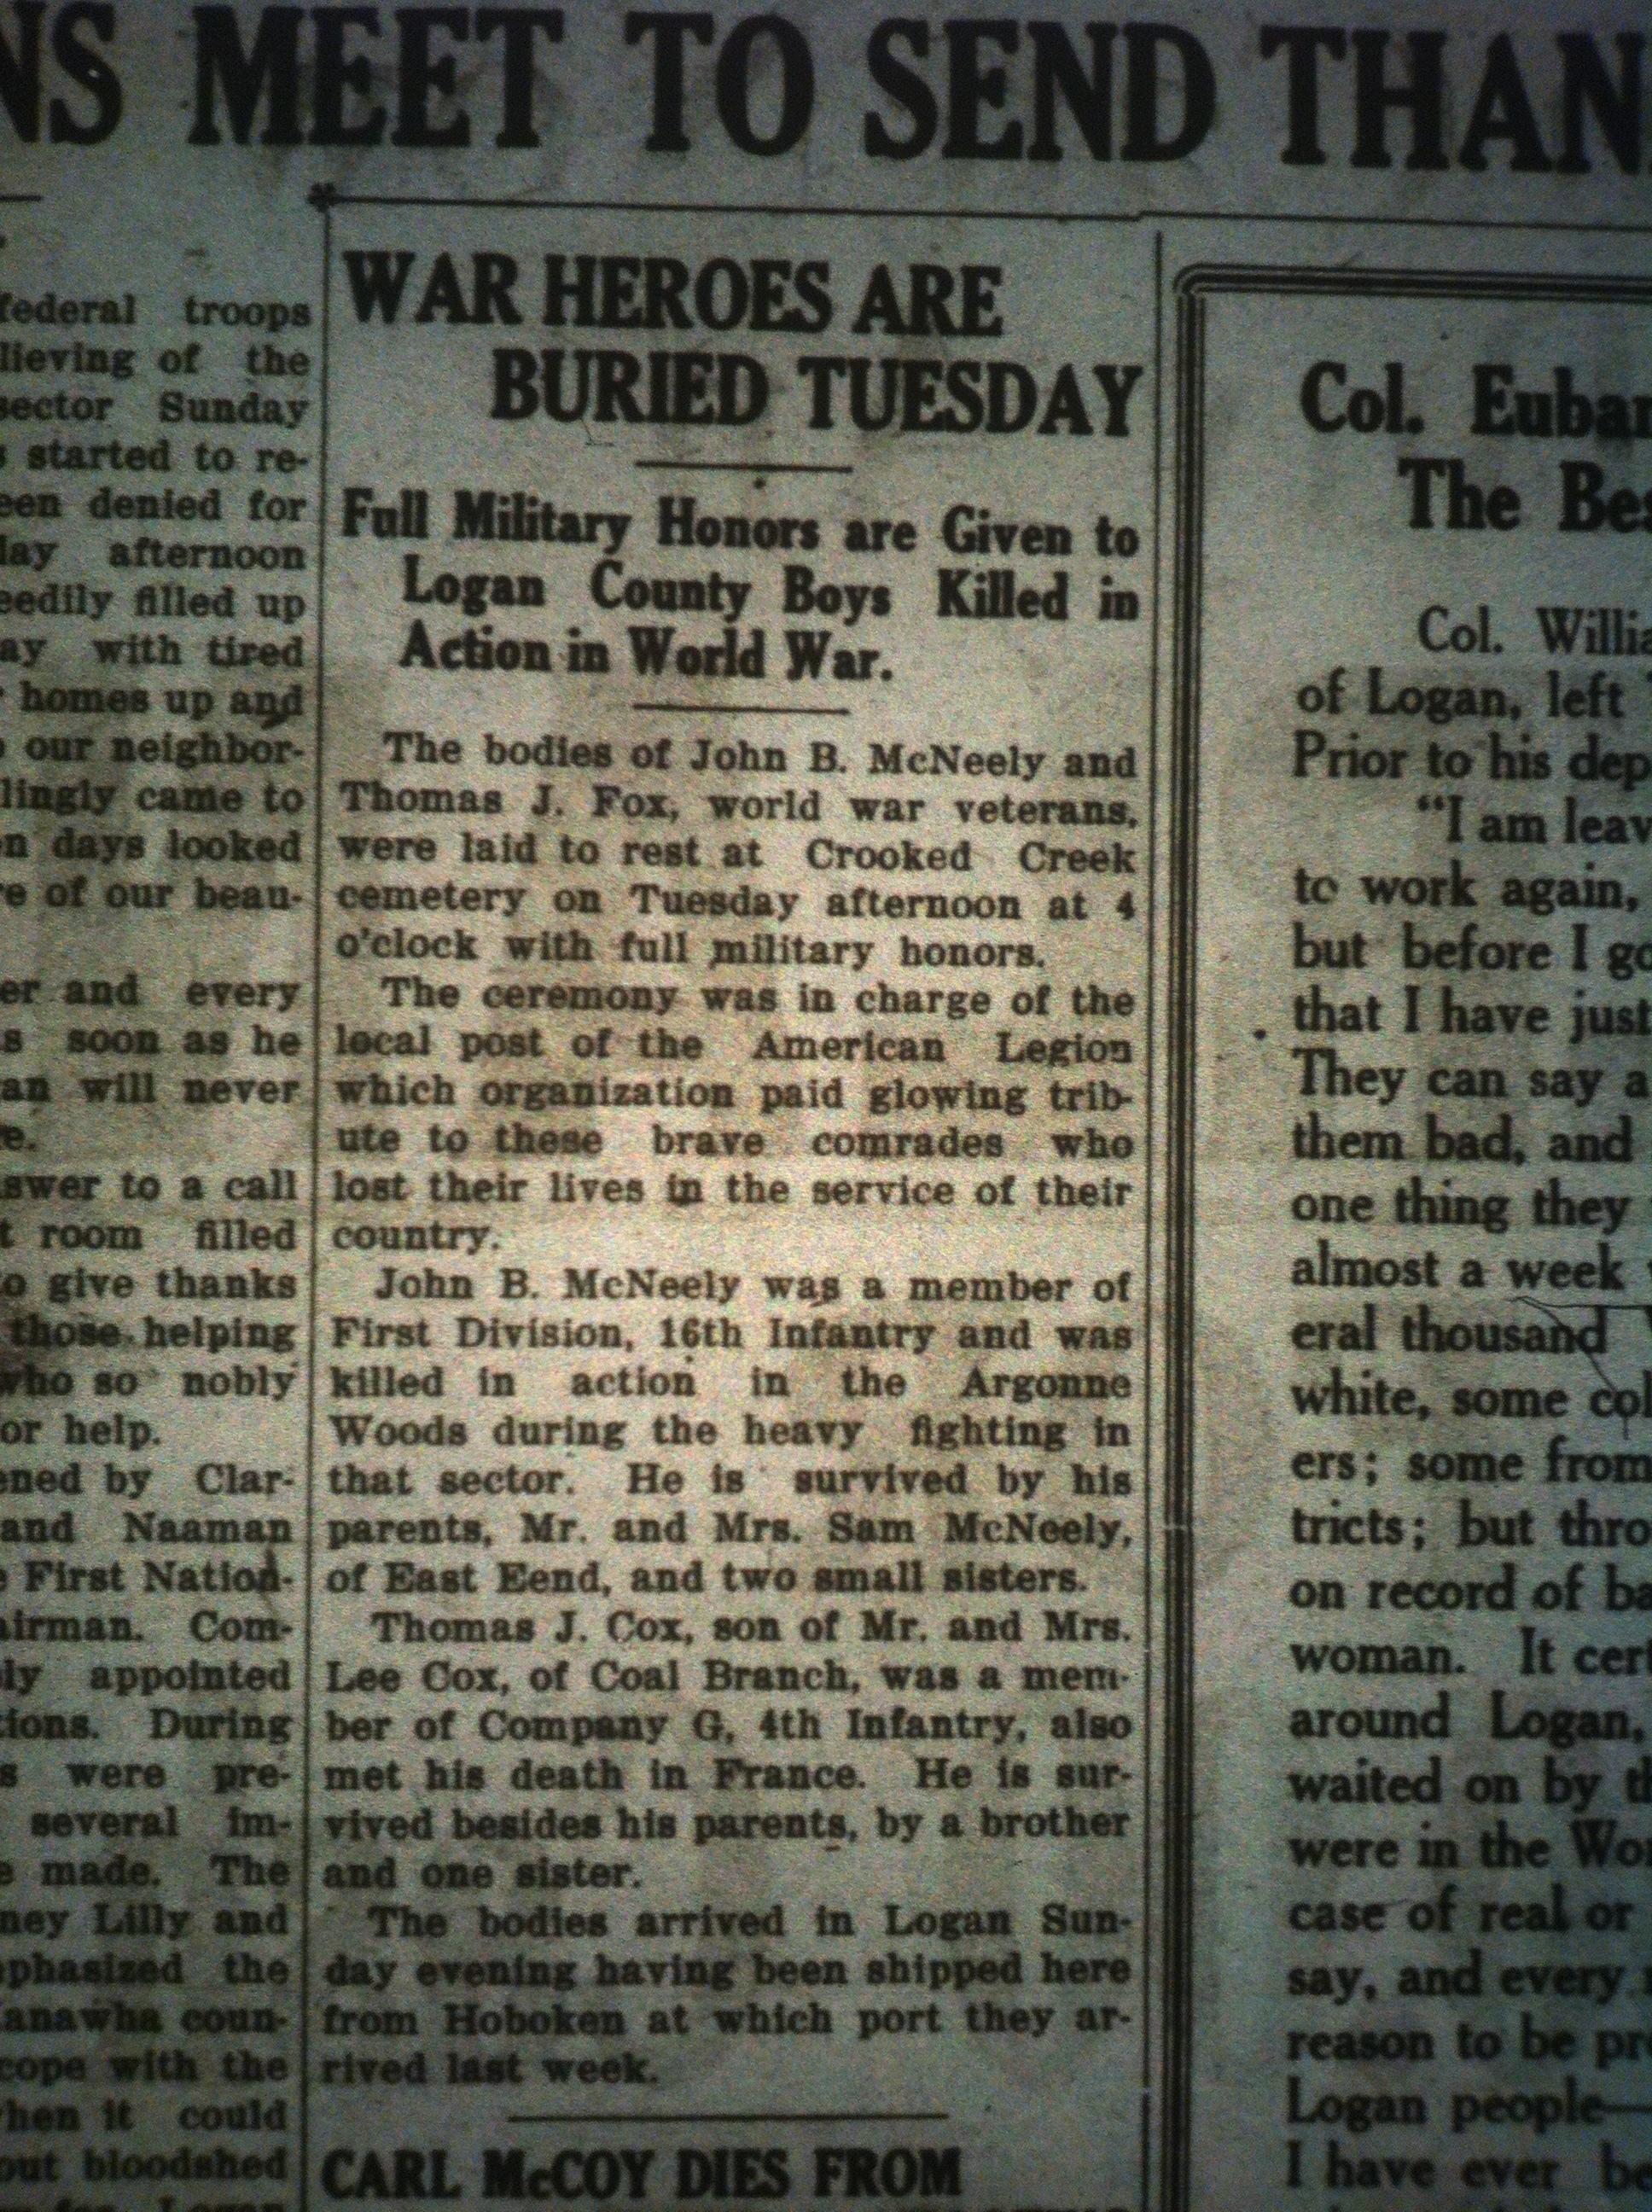 War Heroes are Buried LB 09.09.1921.JPG